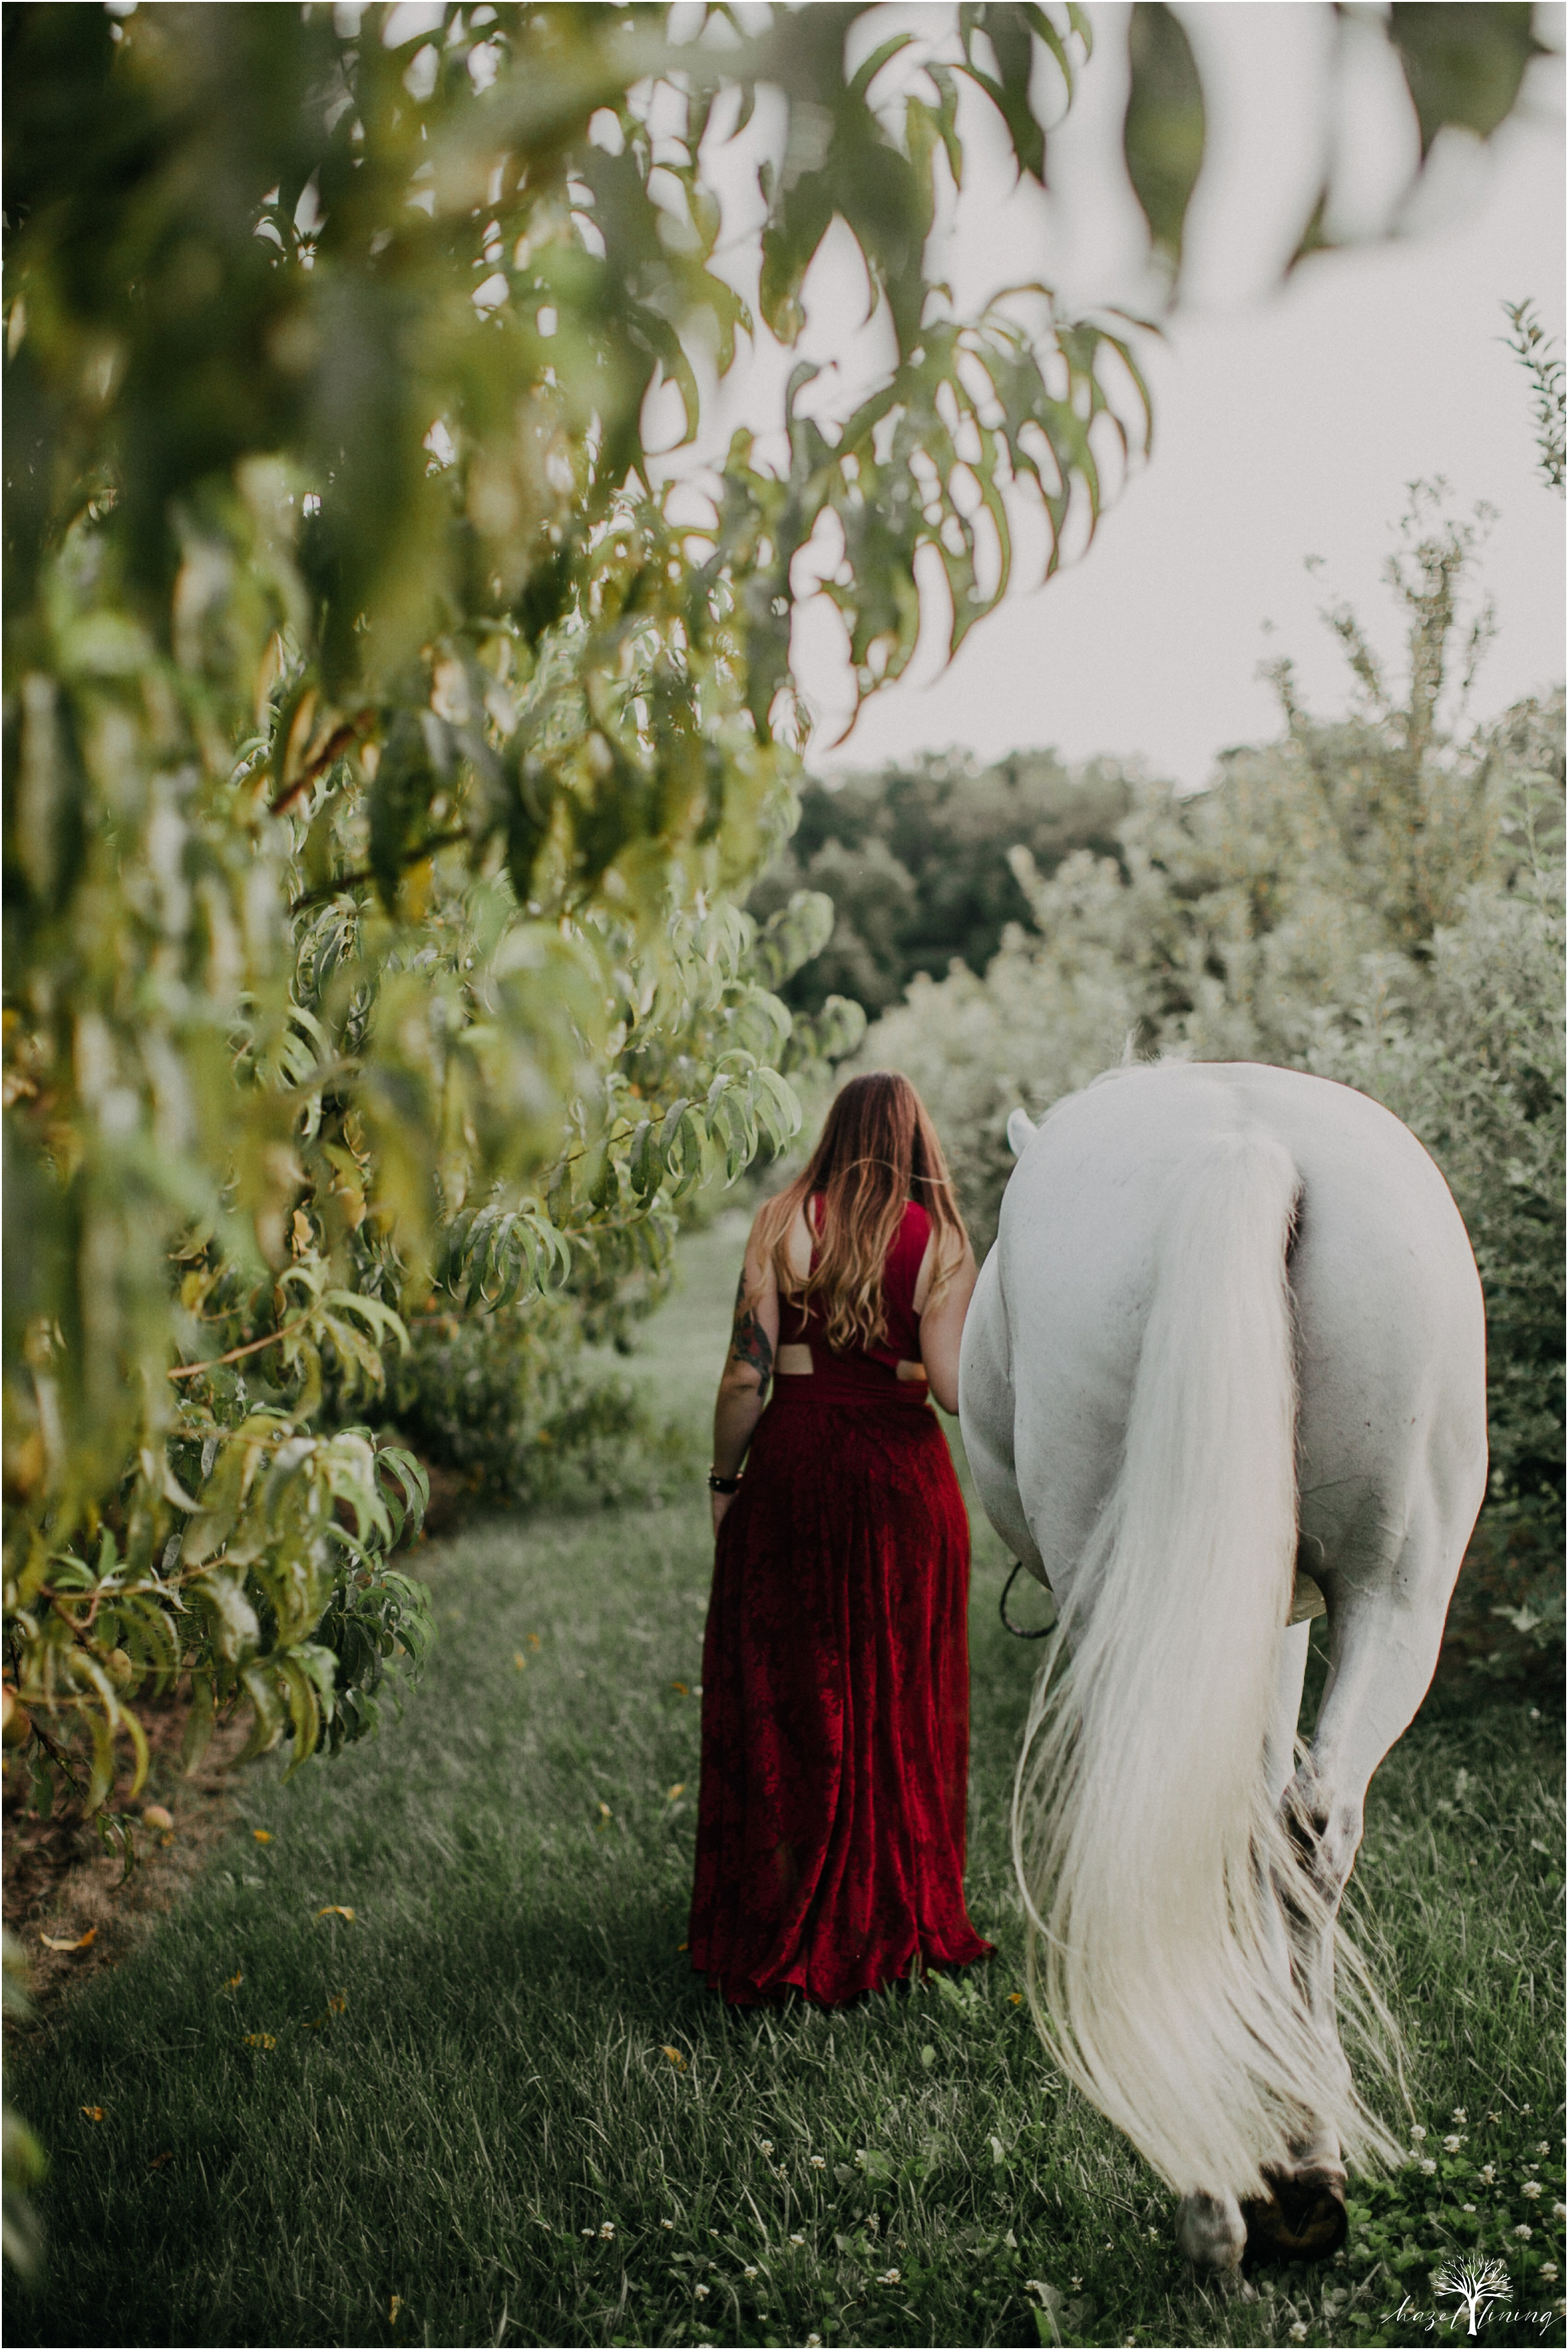 taylor-adams-and-horse-delaware-valley-university-delval-summer-equestrian-portrait-session-hazel-lining-photography-destination-elopement-wedding-engagement-photography_0042.jpg